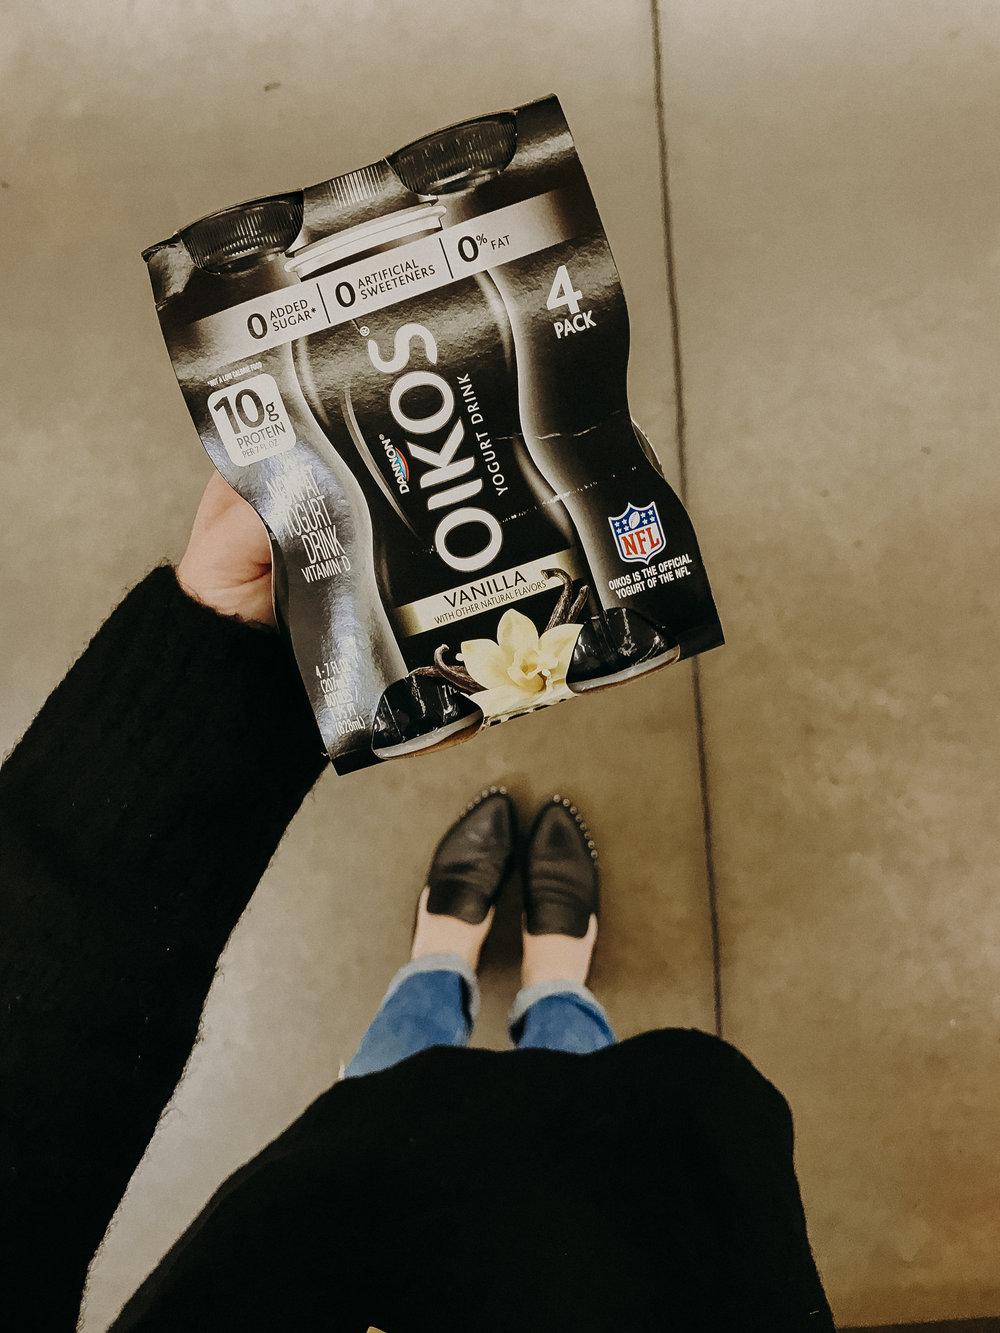 oikos-yogurt-drinks-on-the-go-3.jpg